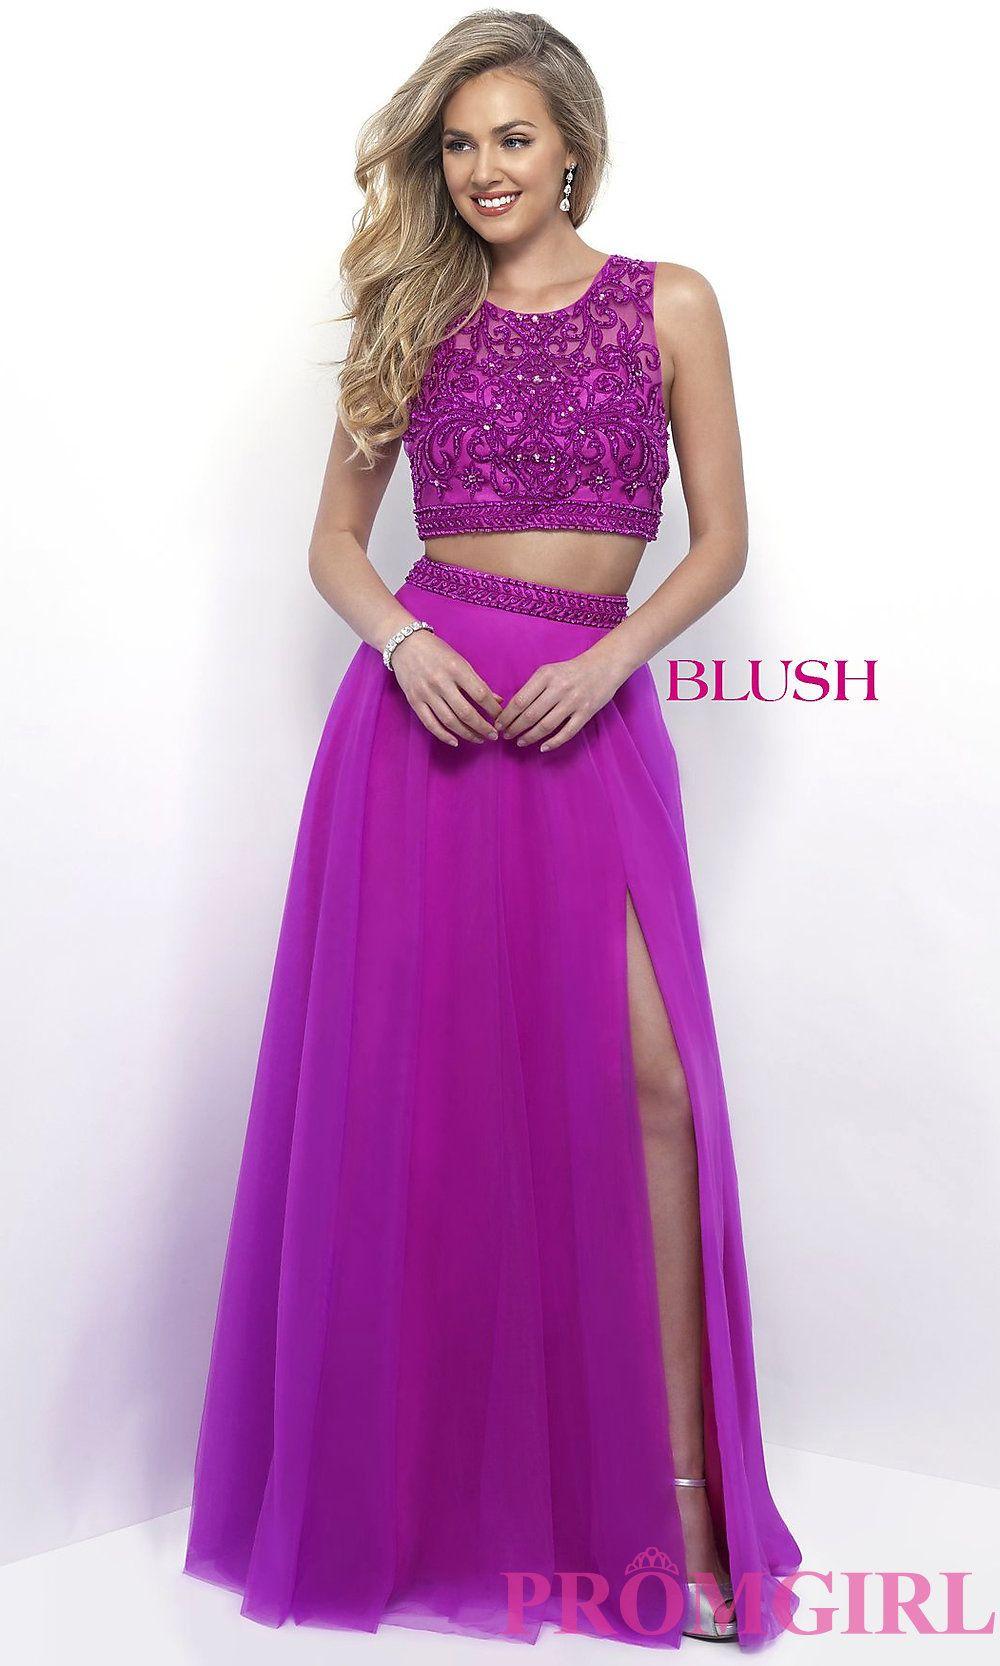 Blush Tulle Formal Dresses